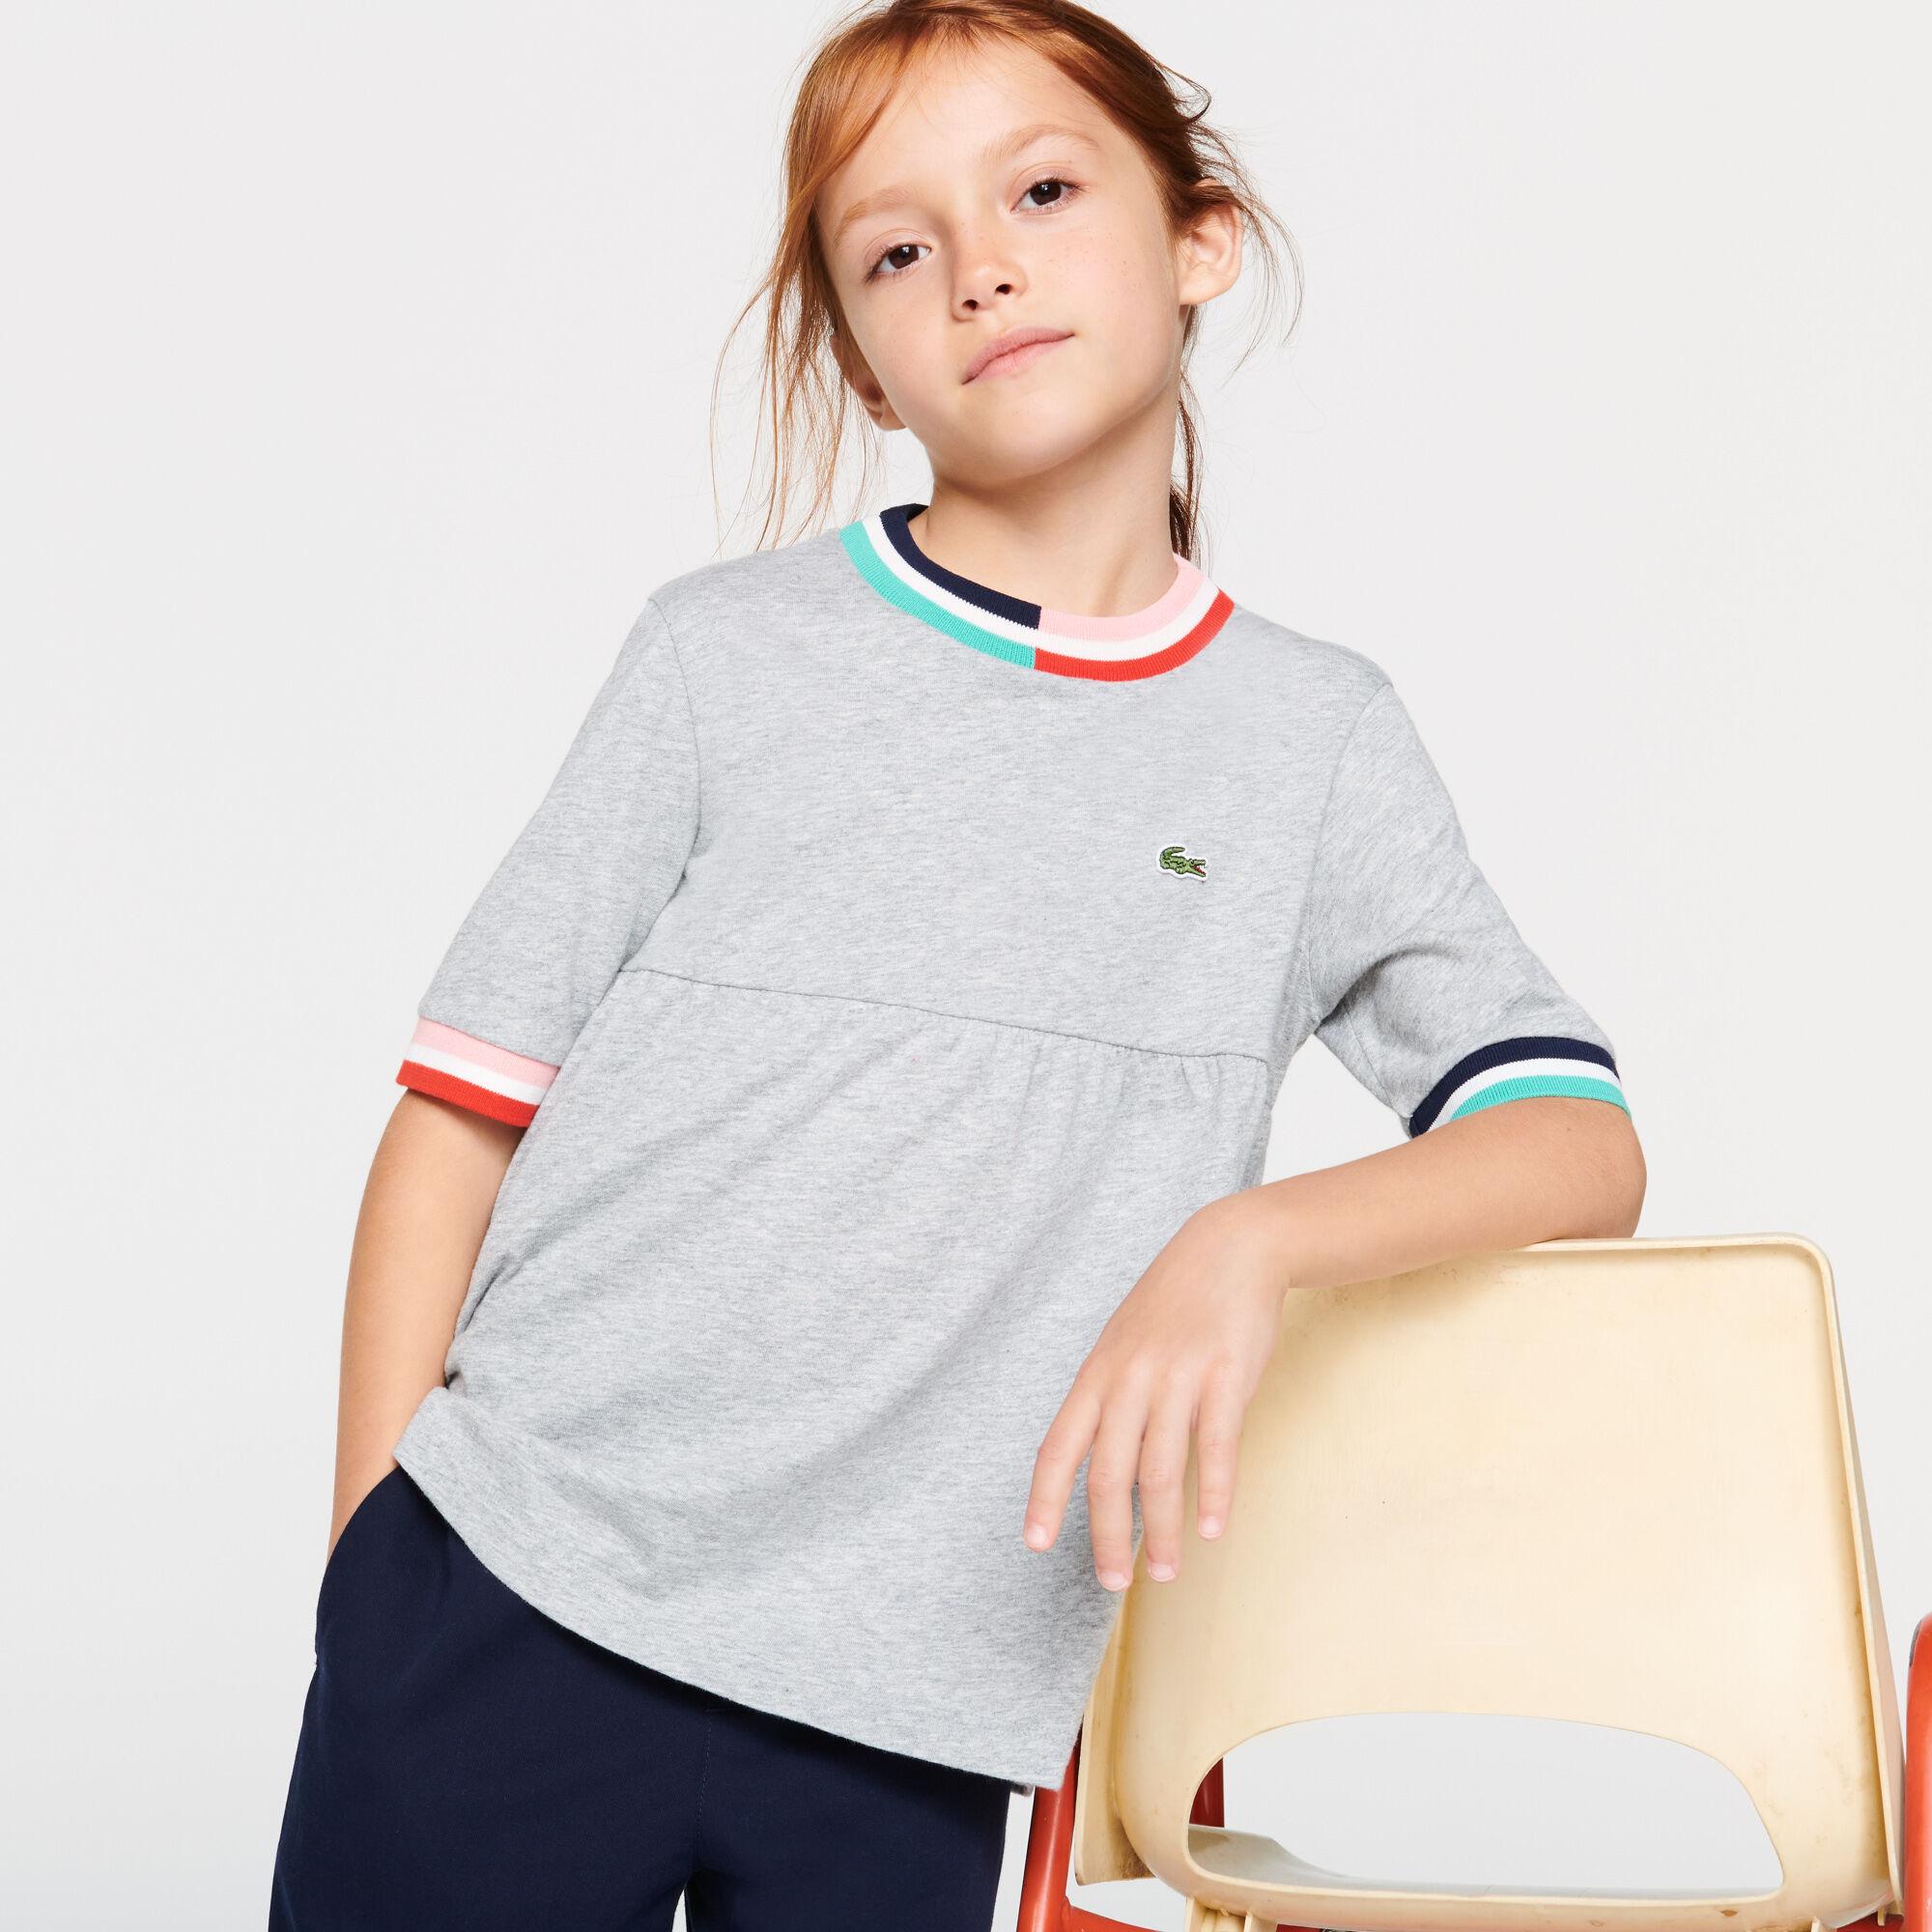 Girls' Striped Accents Flounced Cotton T-shirt